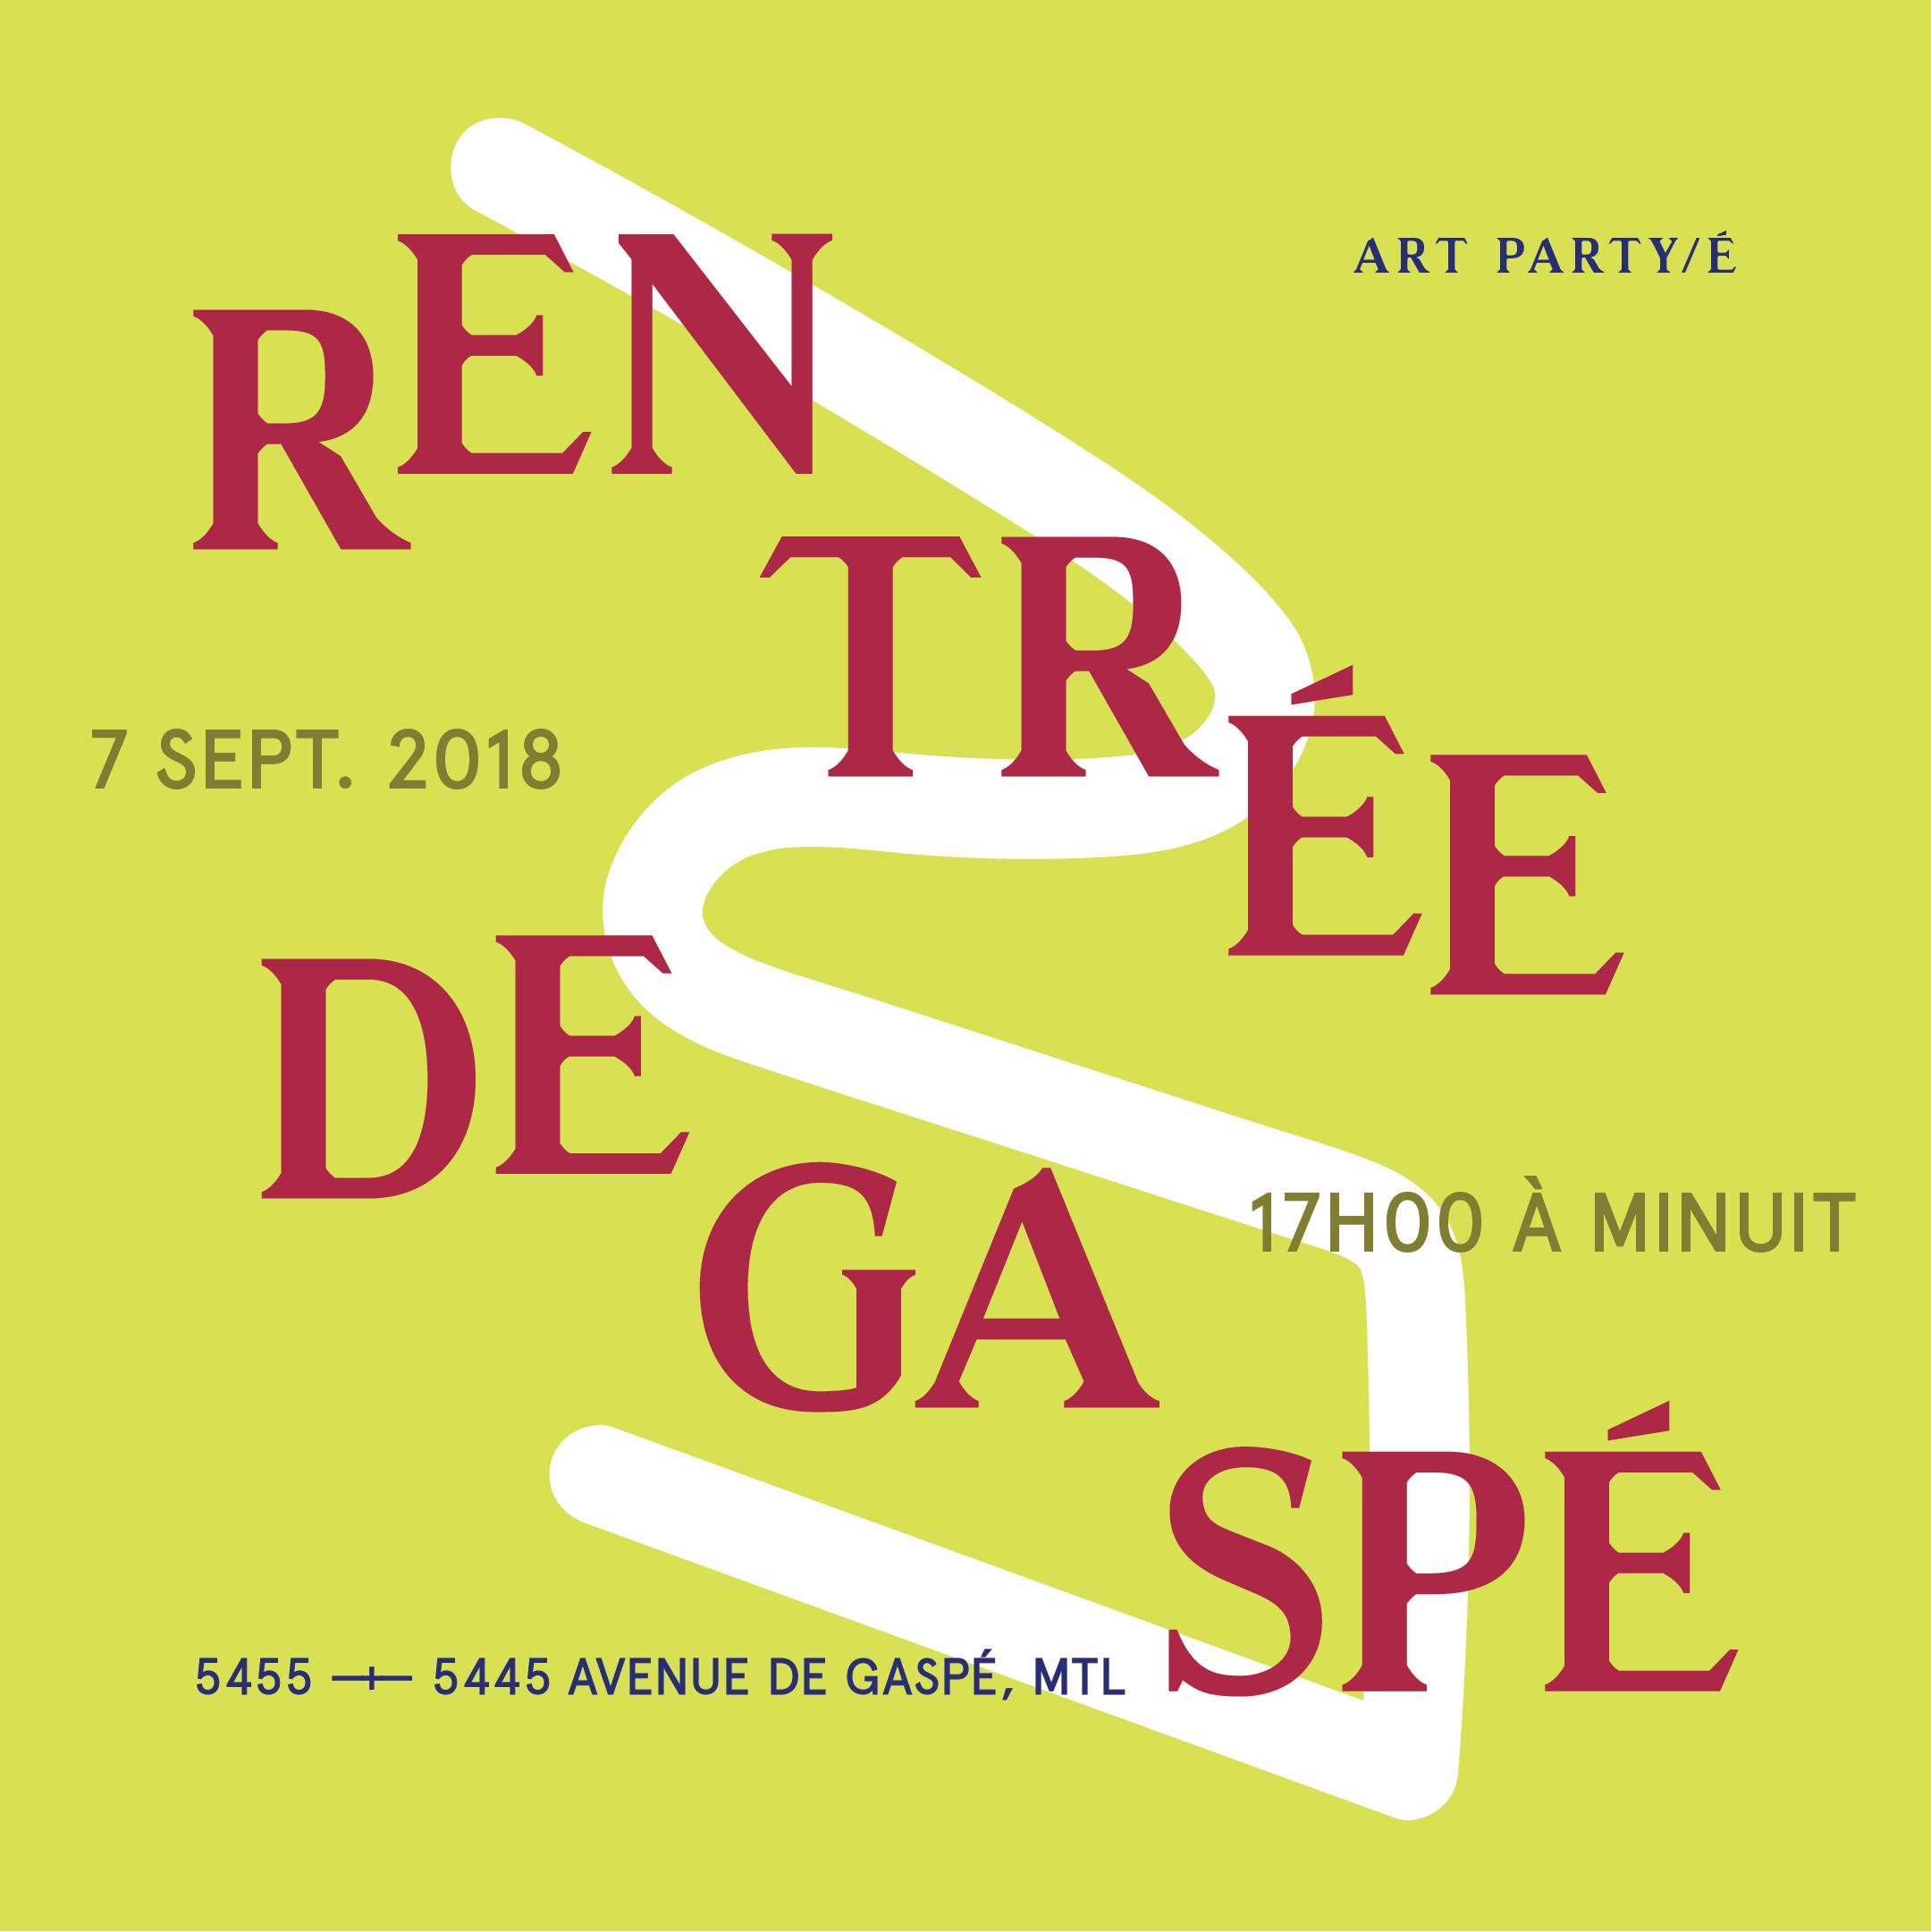 RentreedeGaspe2018—IG - C@2x.png